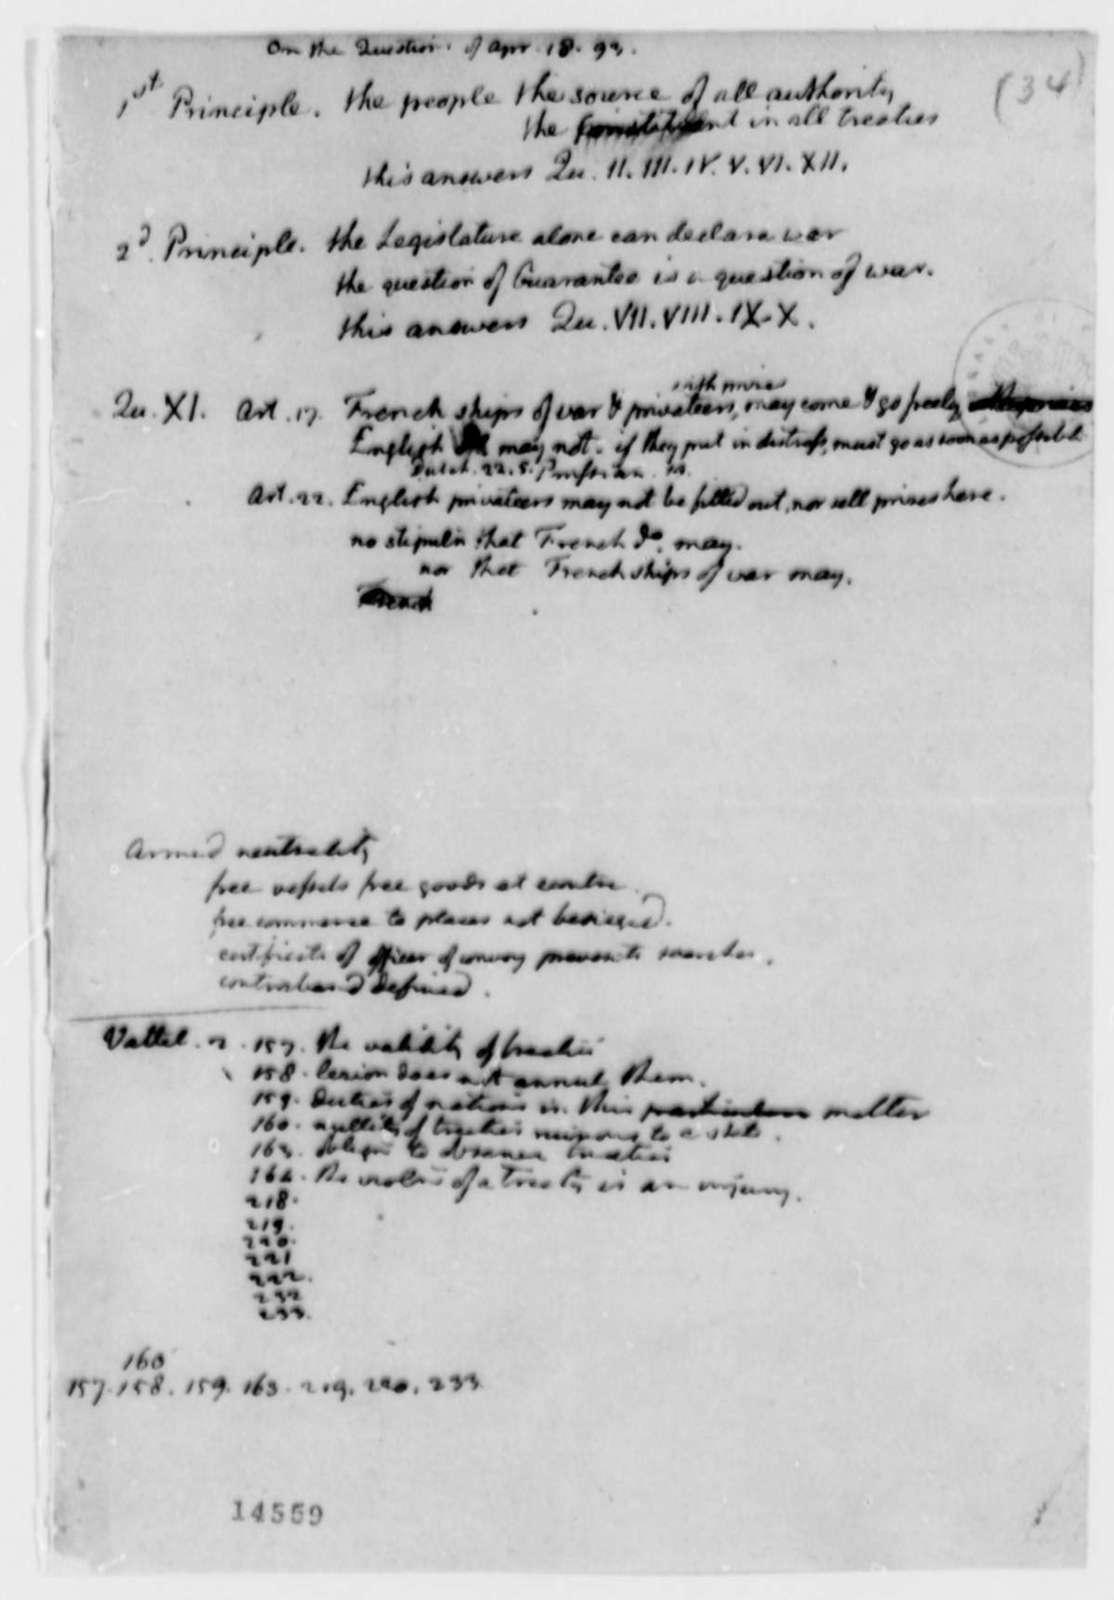 Thomas Jefferson, April 18, 1793, Notes on Principles of Treaties